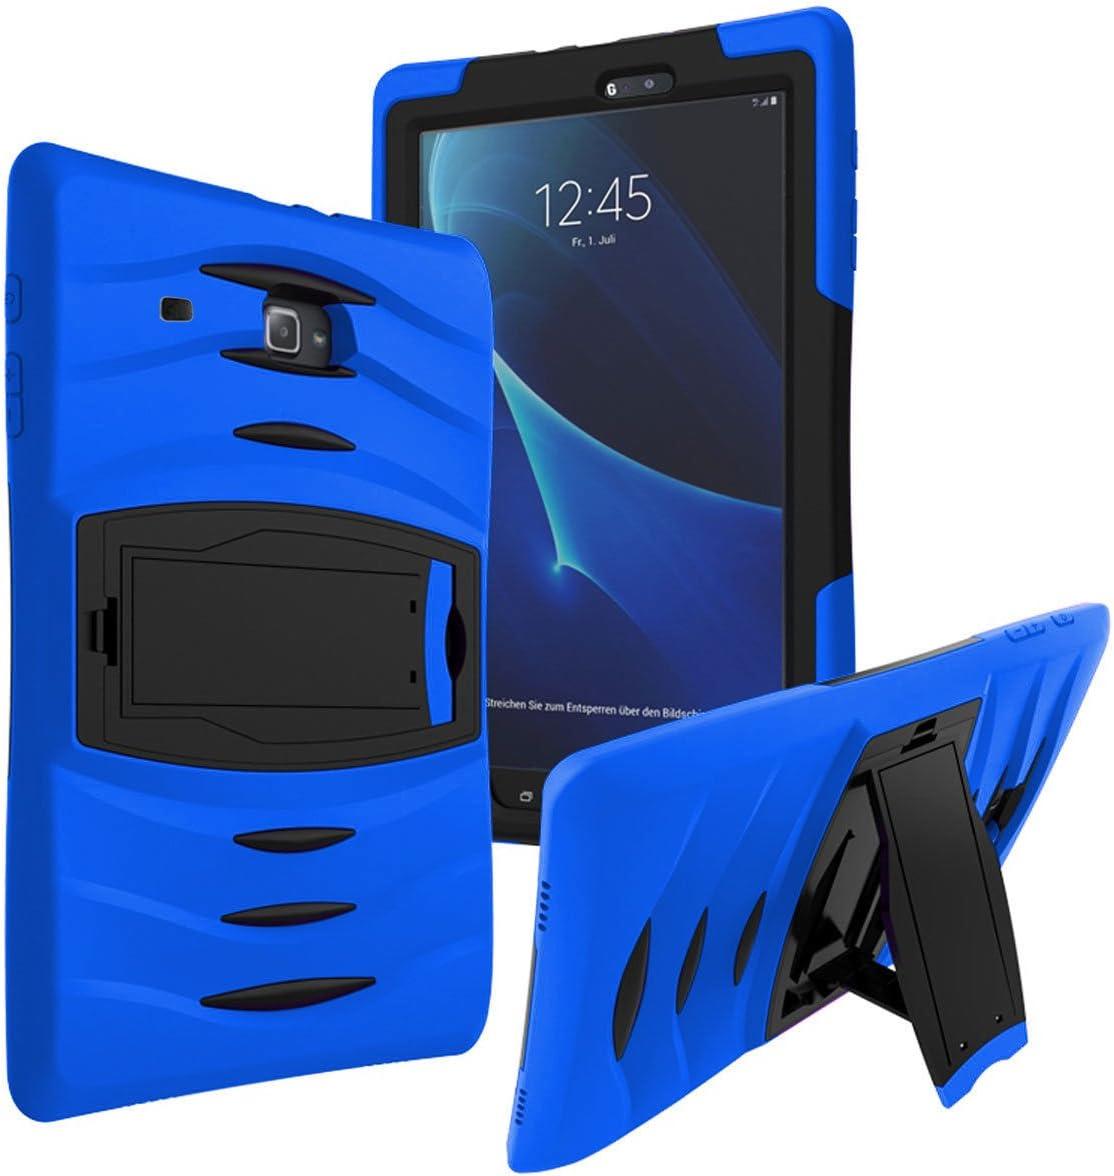 "Galaxy Tab E 7.0 Lite Case SM-T113, KIQ Shockproof Heavy Duty Case, Kickstand, Screen Protector Cover, for Samsung Galaxy Tab E 7.0"" / Tab 3 Lite 7-inch T110/T113/T116/T111 (Armor Blue)"